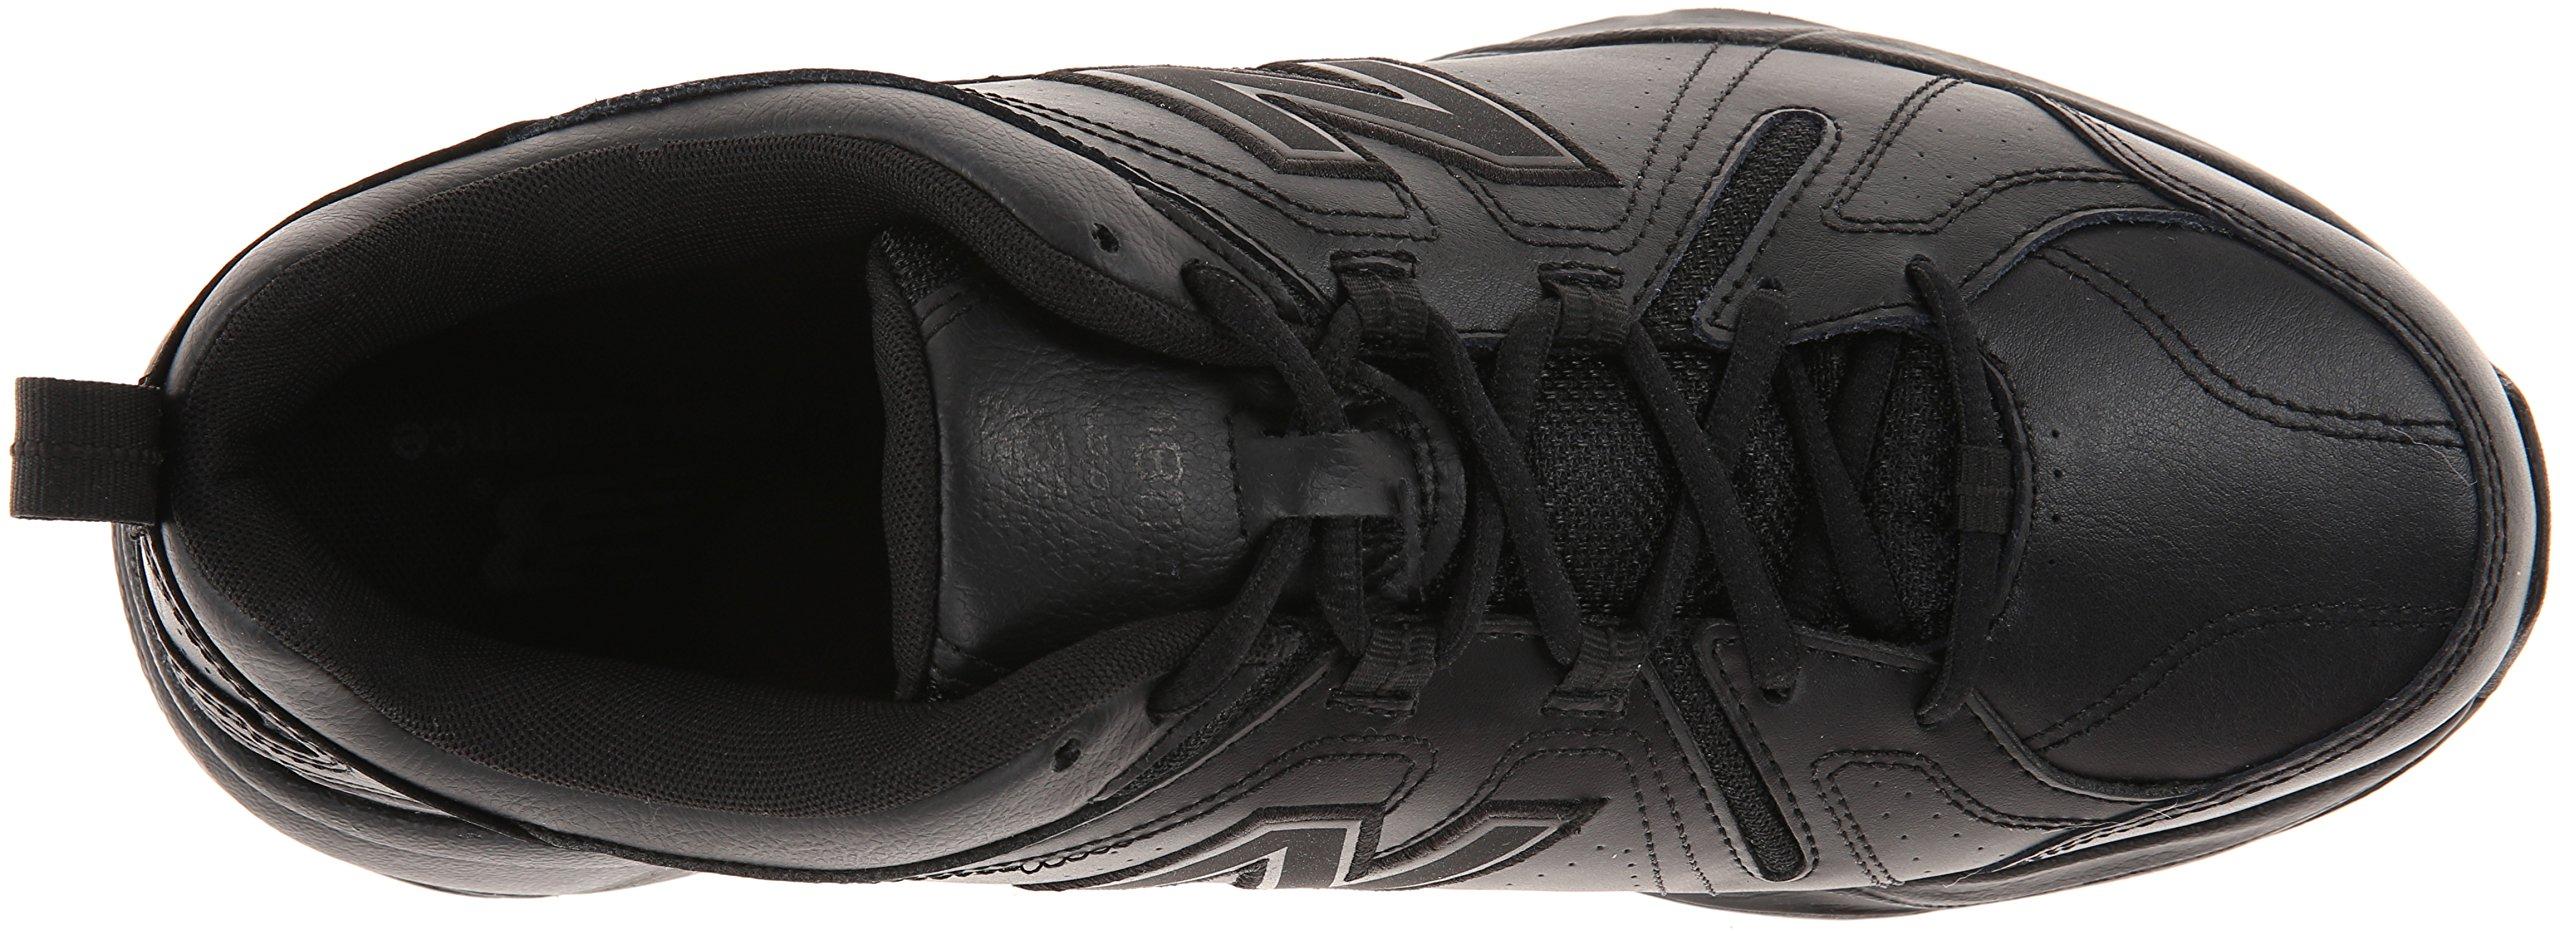 New Balance Men's MX608v4 Training Shoe, Black, 6.5 D US by New Balance (Image #8)